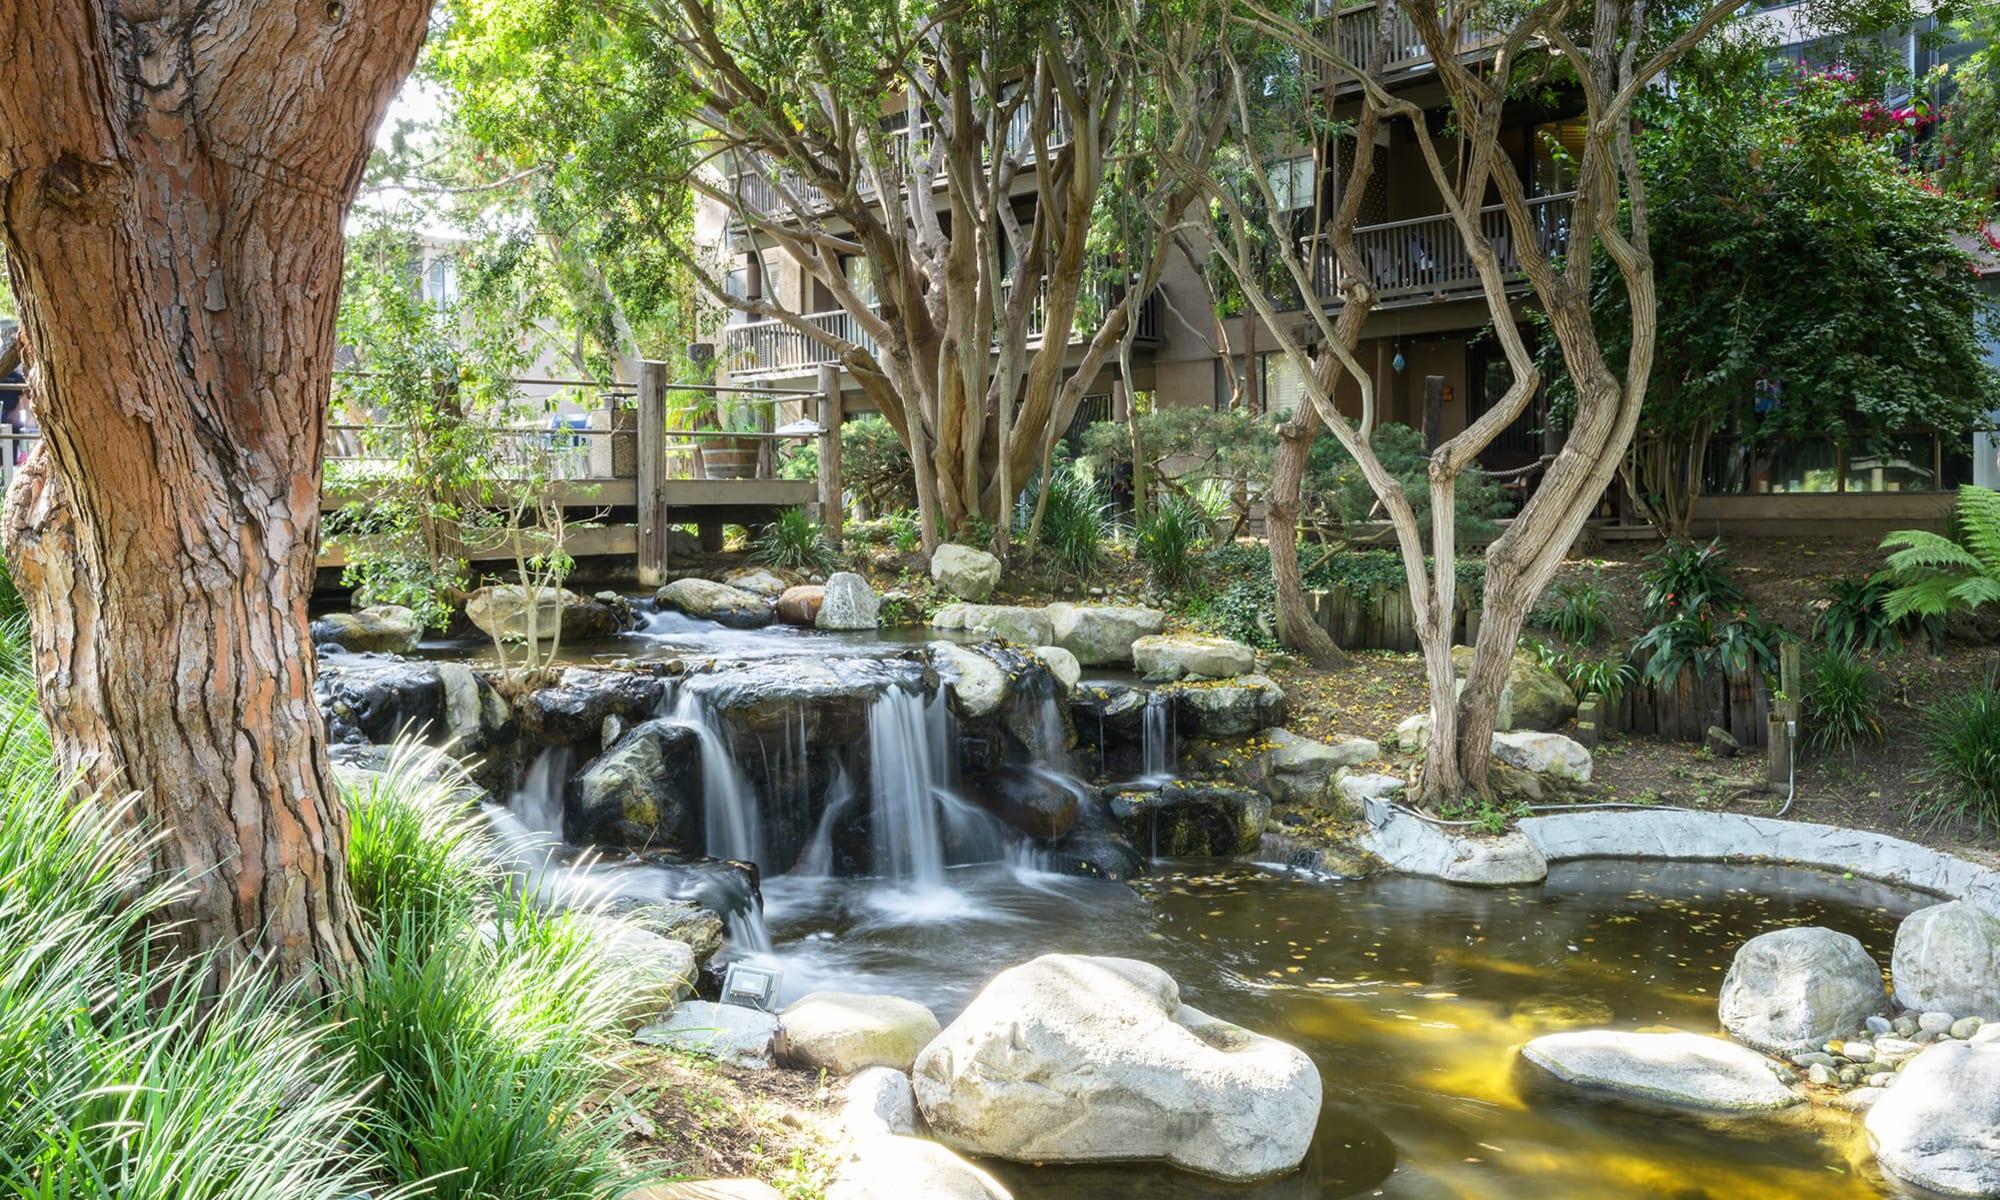 Stream at Mariners Village in Marina del Rey, California